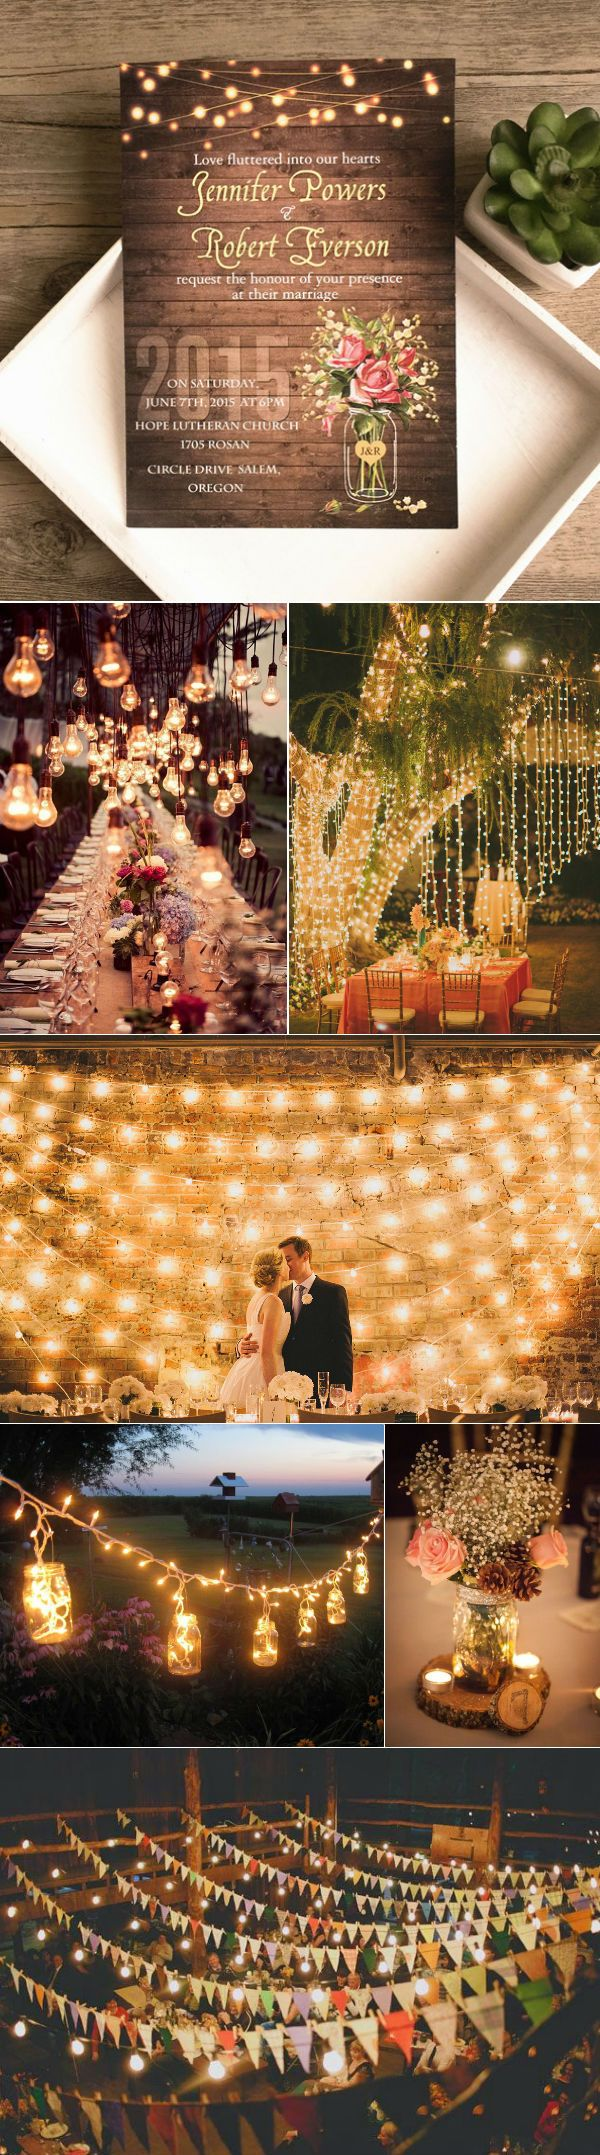 Uncategorized outdoor vintage glam wedding rustic wedding chic - Five Rustic Wedding Themes With Mason Jars